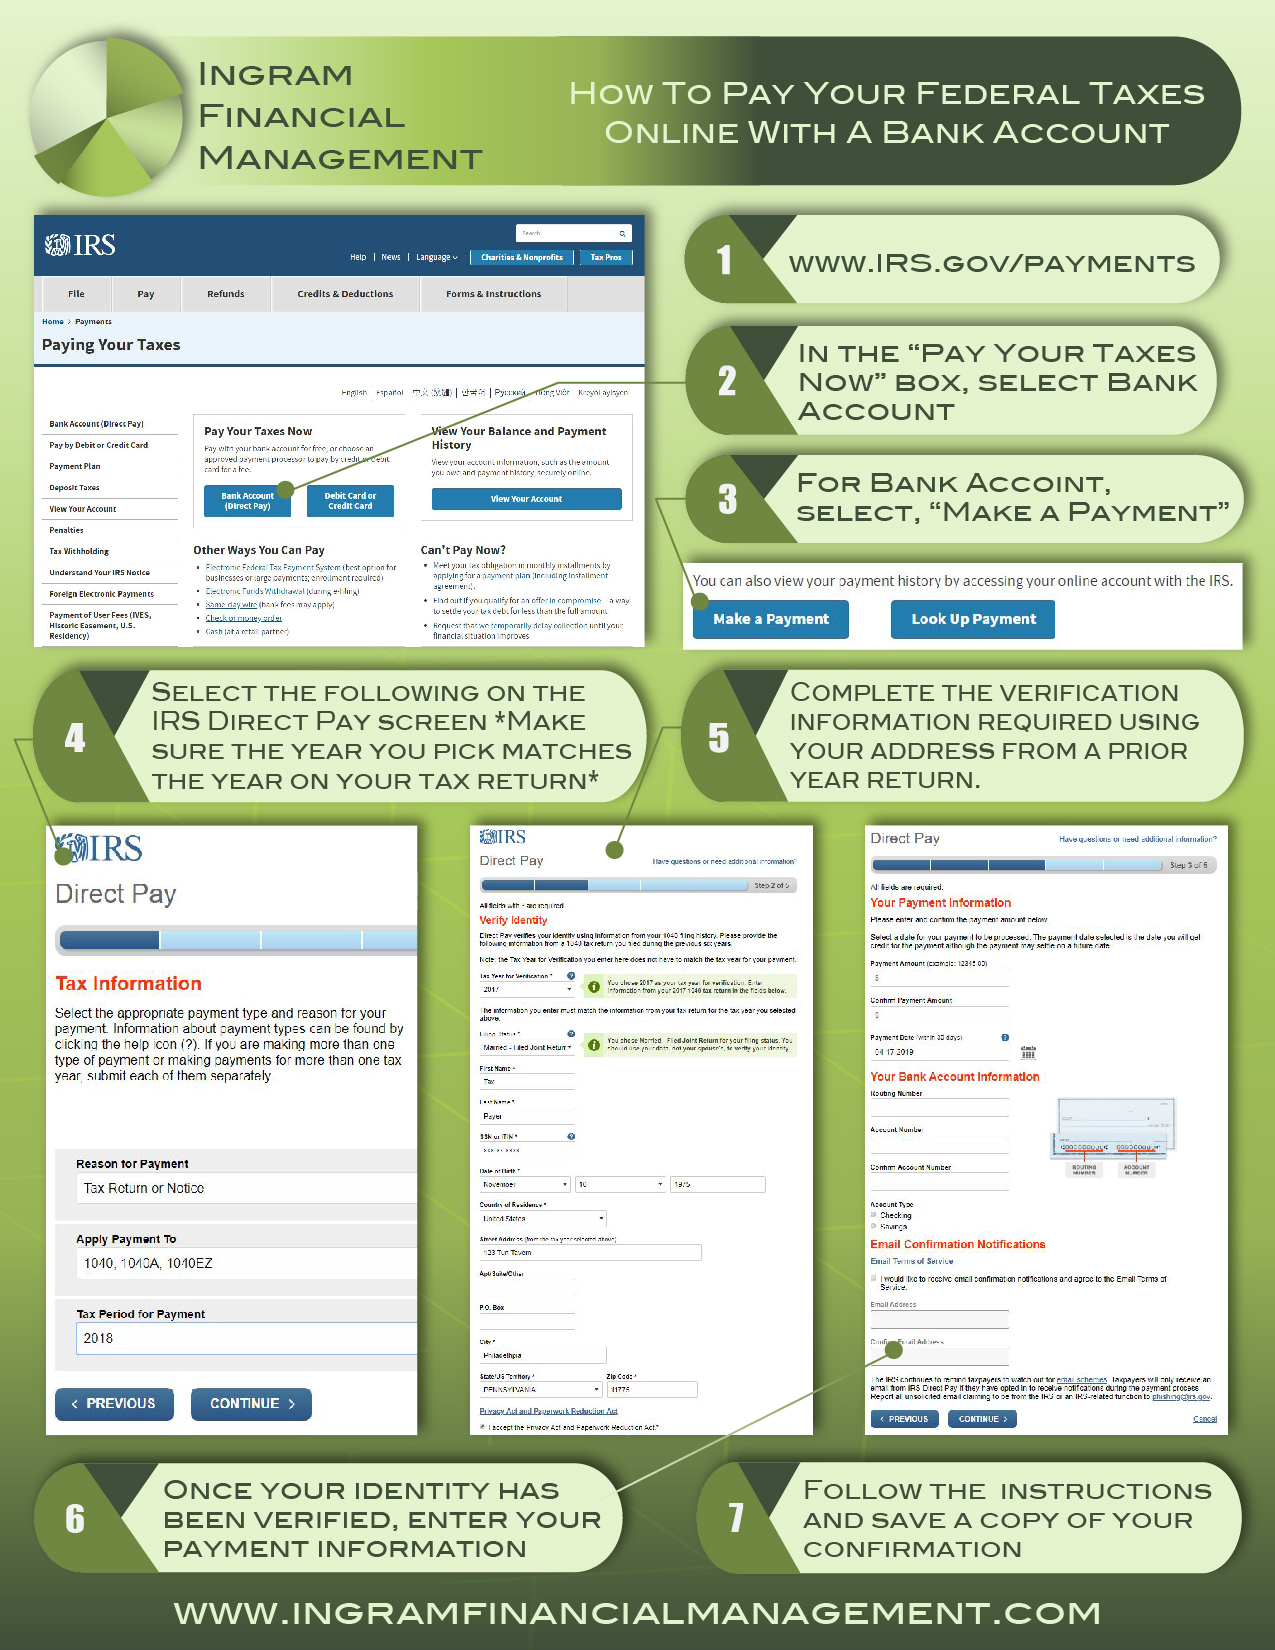 Ingram Financial Management Online Bank Payment